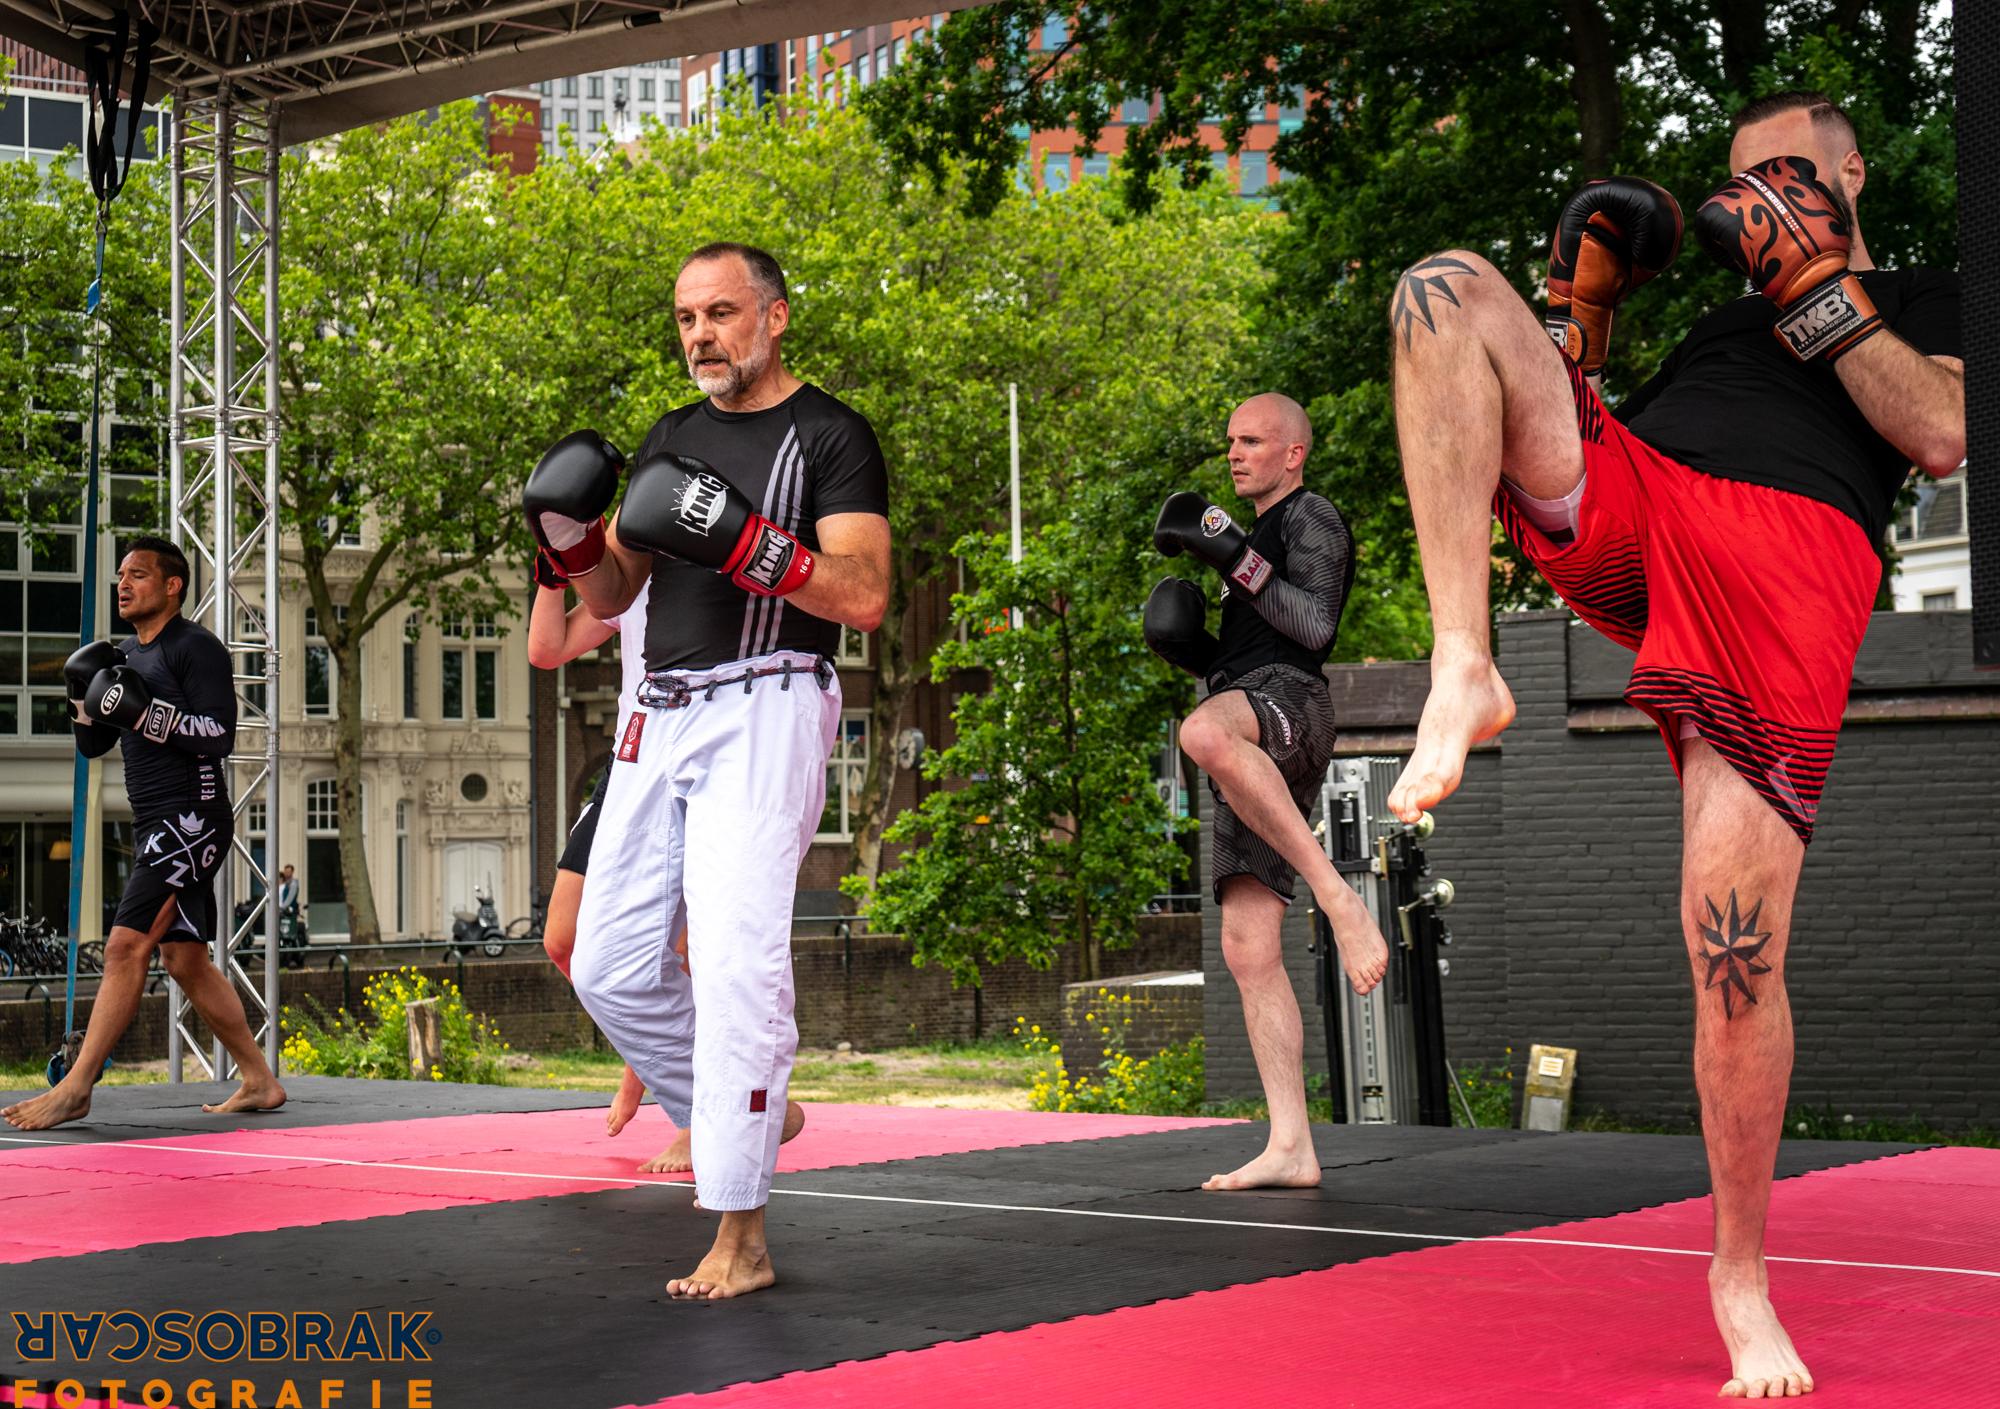 vechtsport mma kickboksen erneste hoost den haag oscar brak fotografie